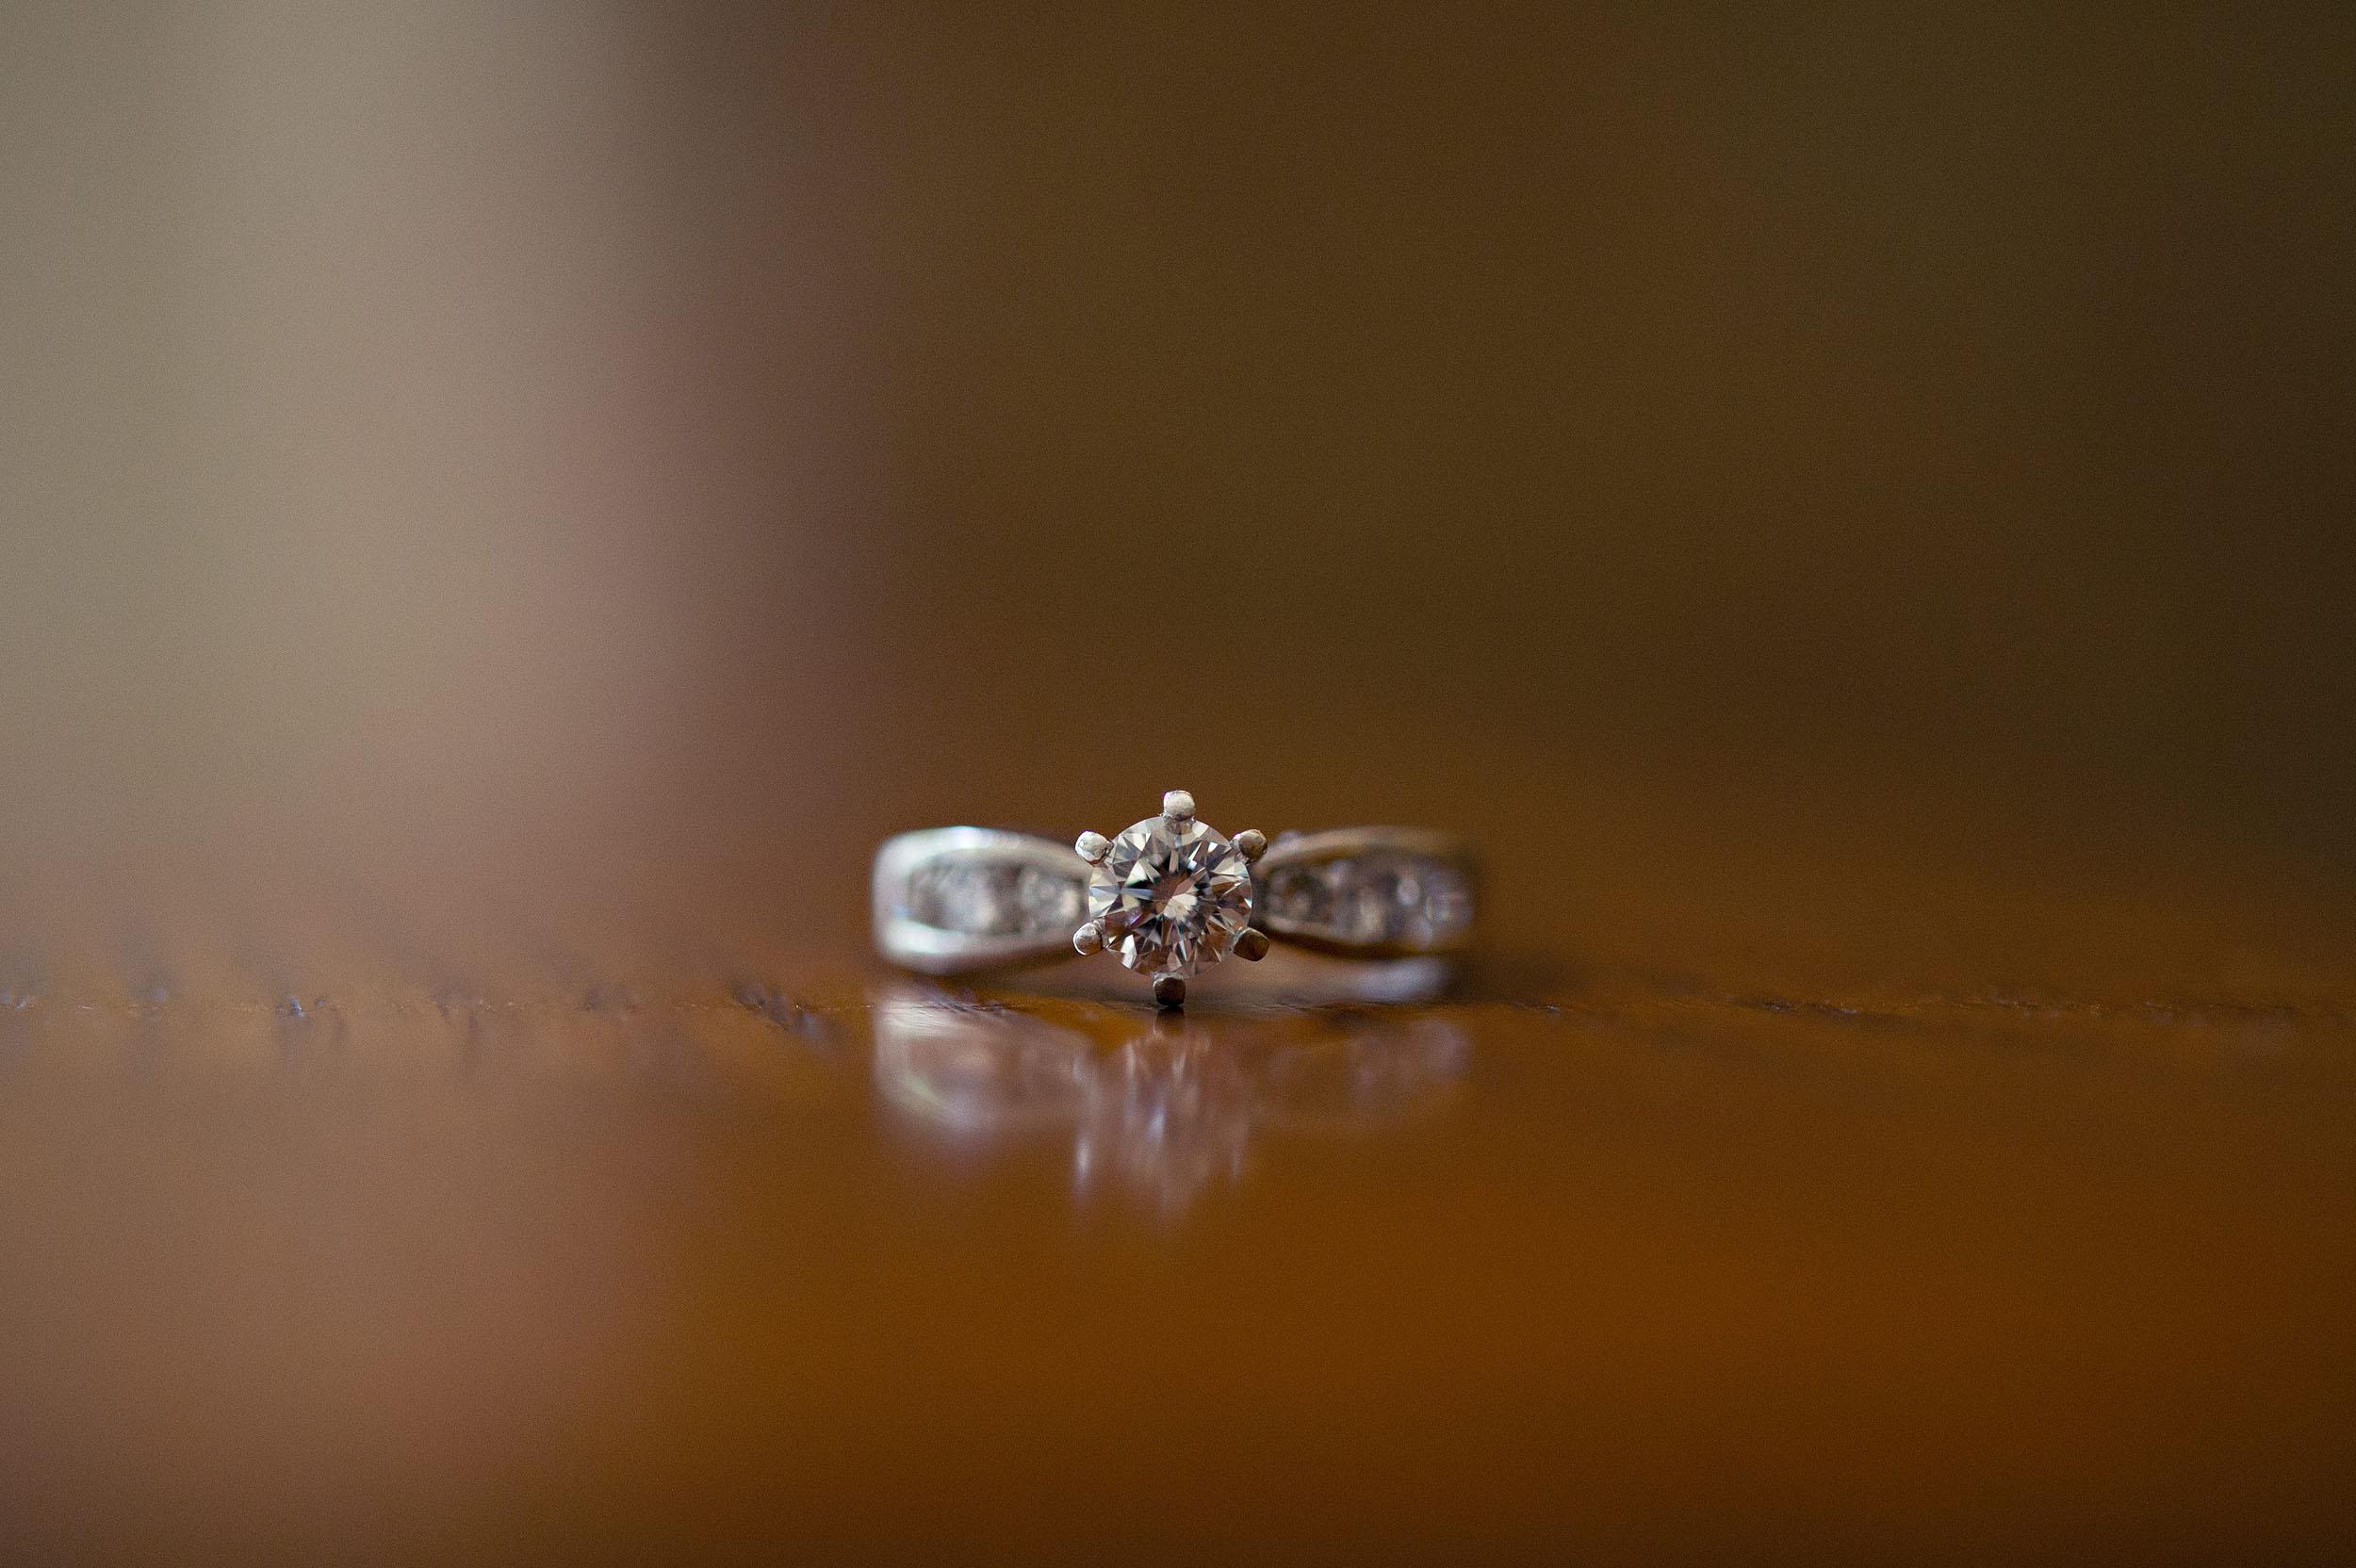 Bride's diamond solitaire wedding ring.